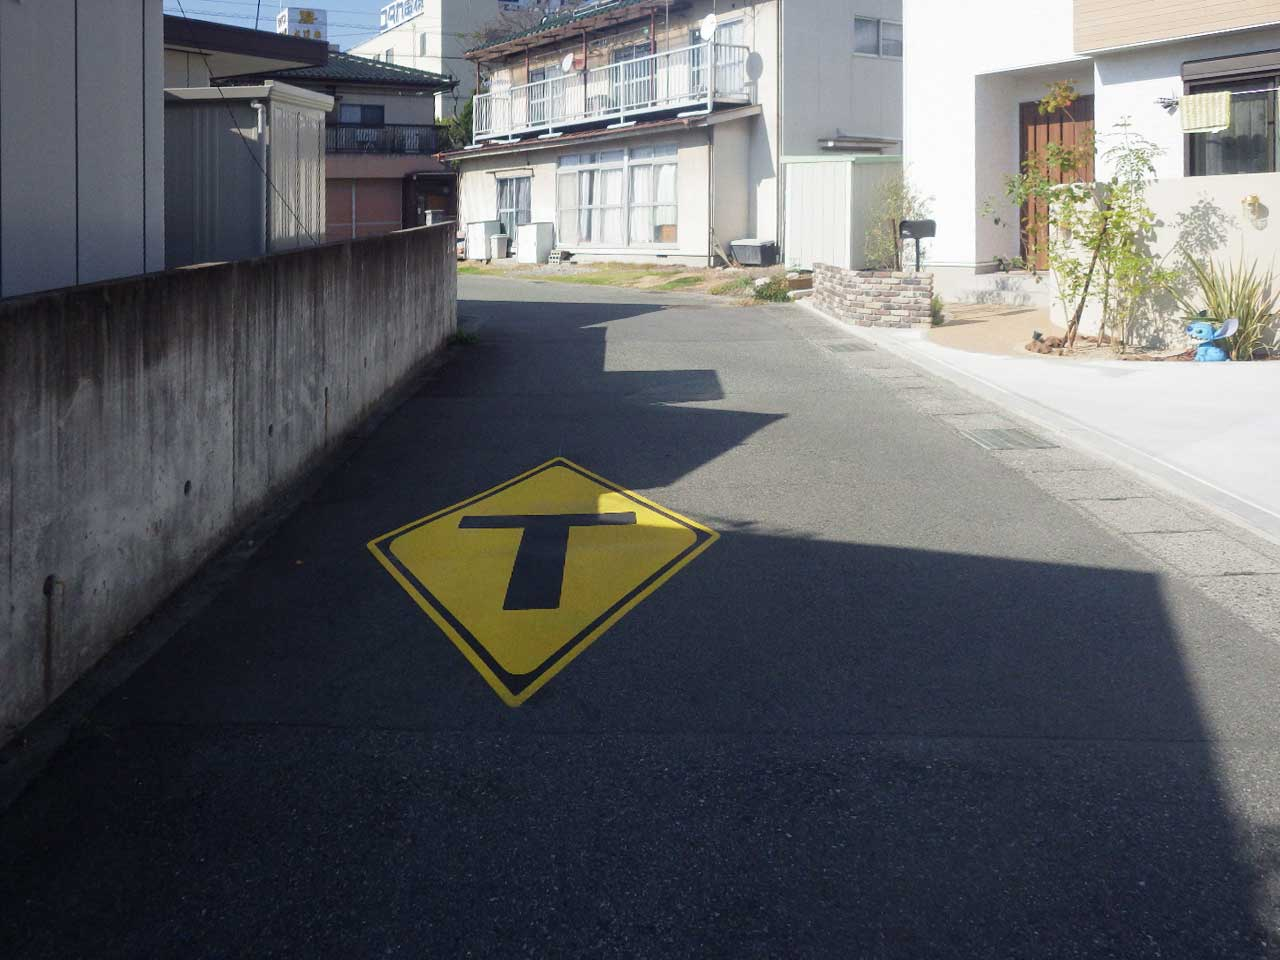 T形道路交差点あり(201-C)標識マーク